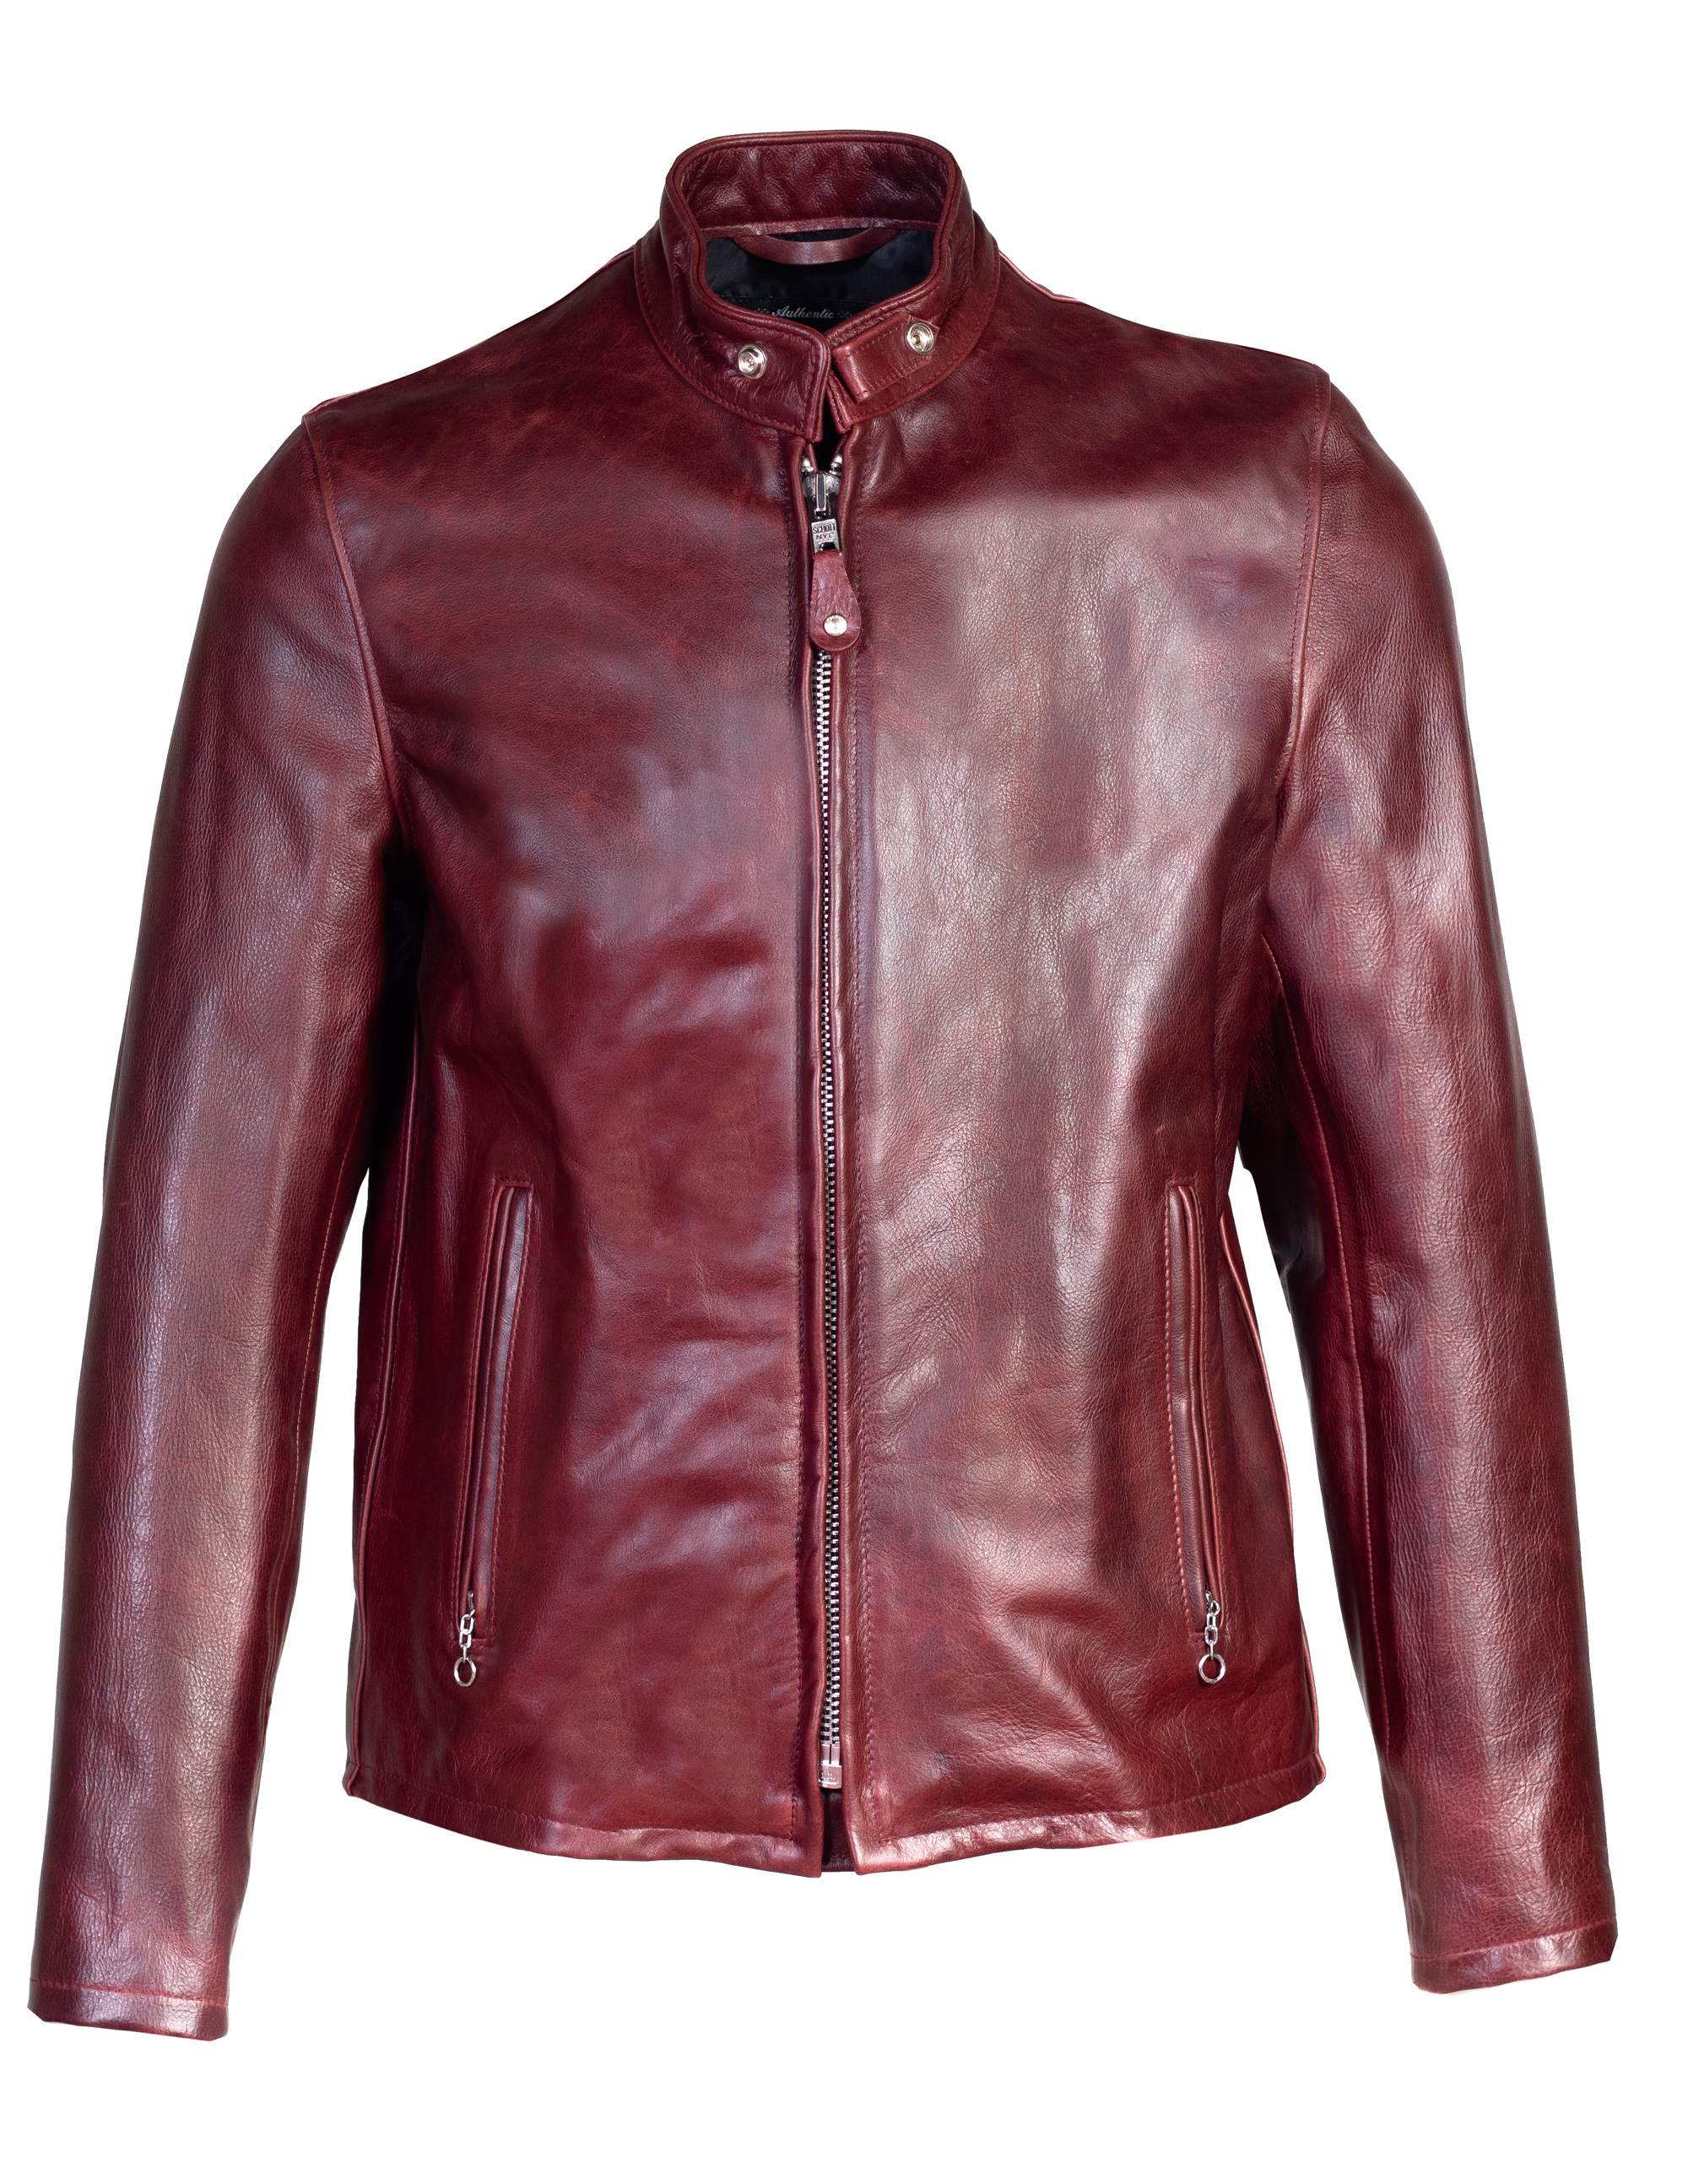 New Race Men/'s Black Casual City Biker Style Real Soft Lambskin Leather Jacket